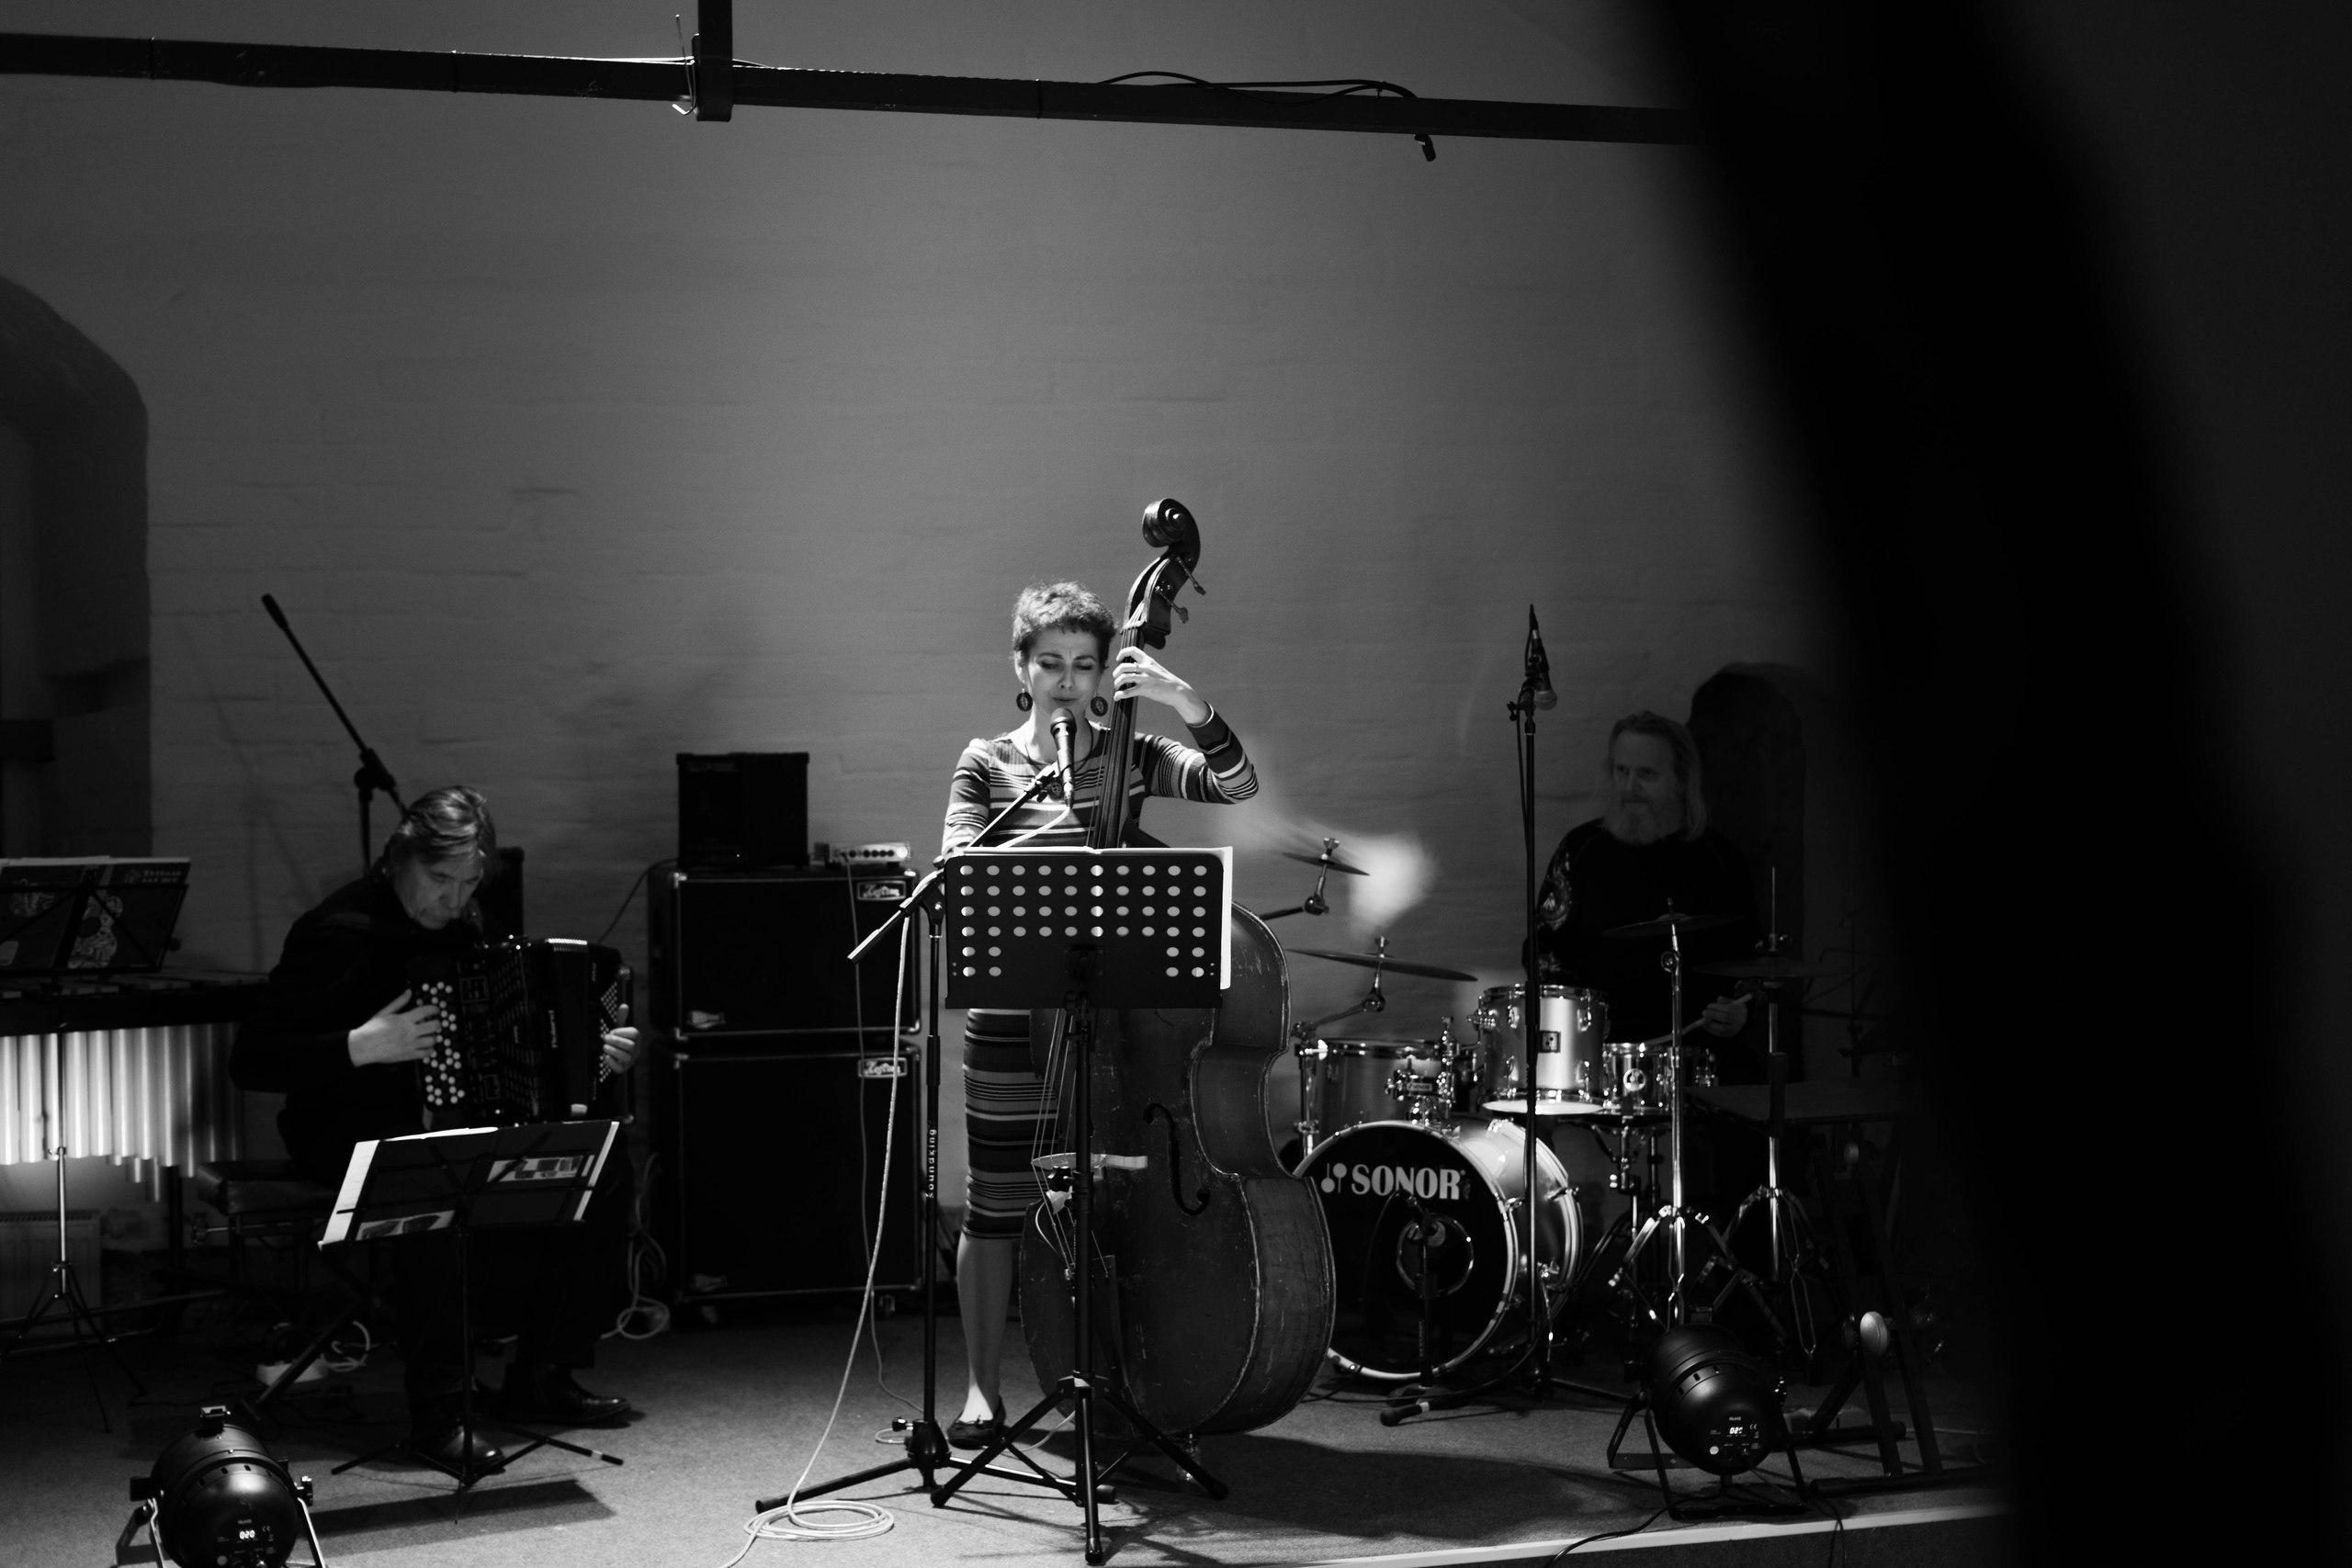 Джаз-мастерская